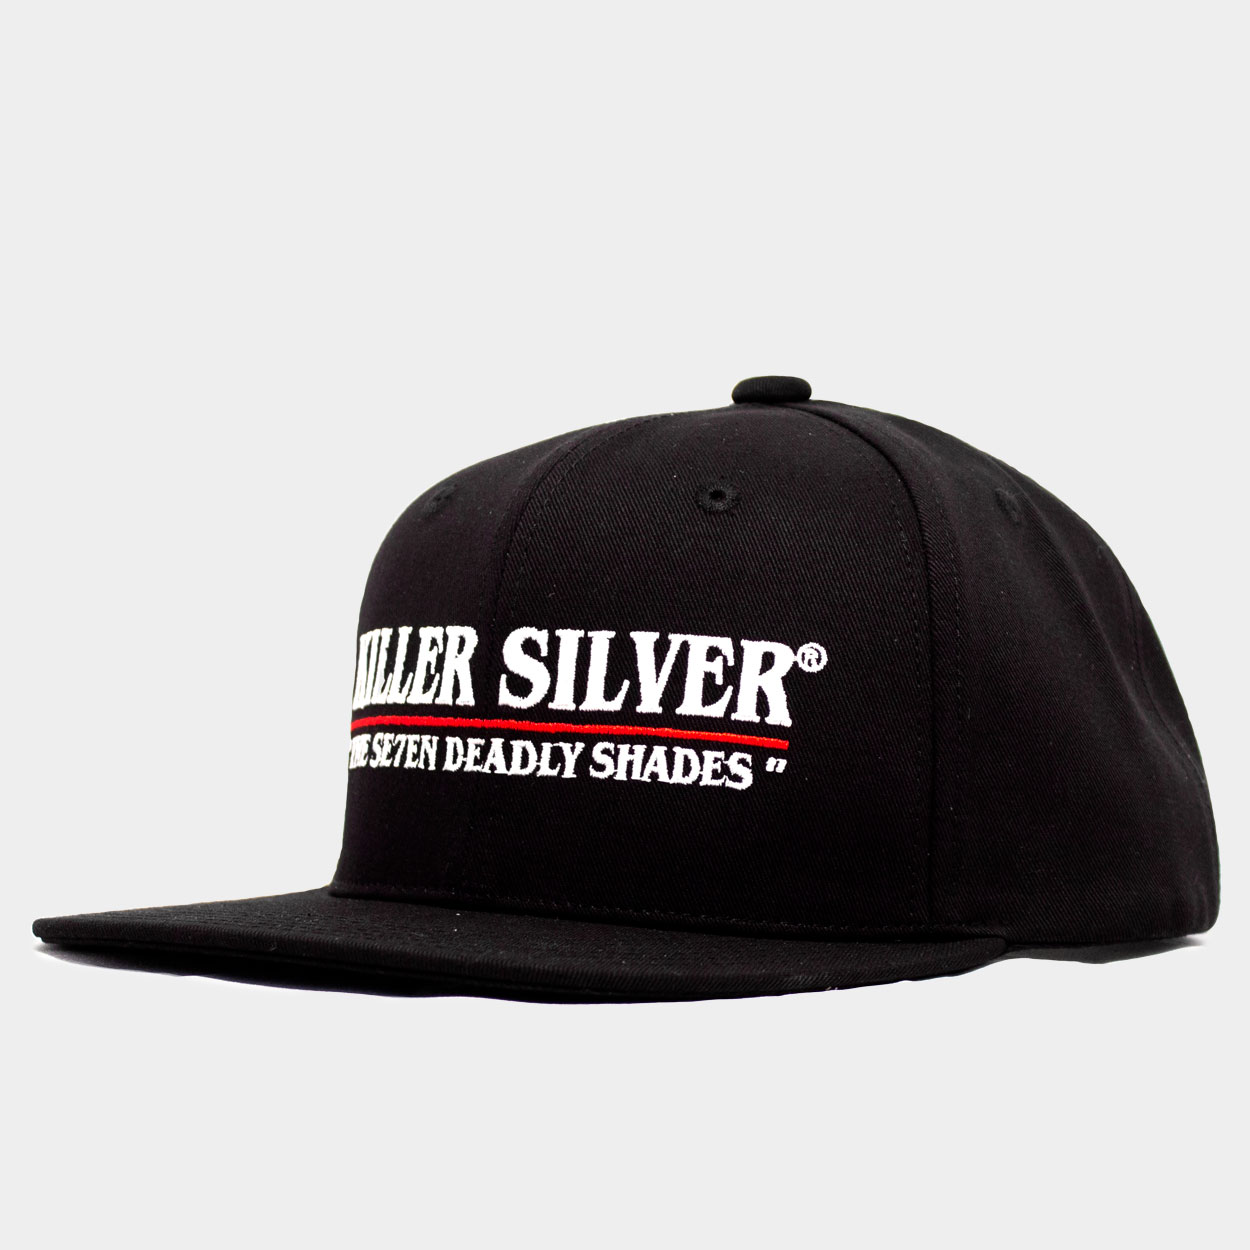 Baseball Hat-Flat Bill-Merchandise-White Thread-Killer Silver